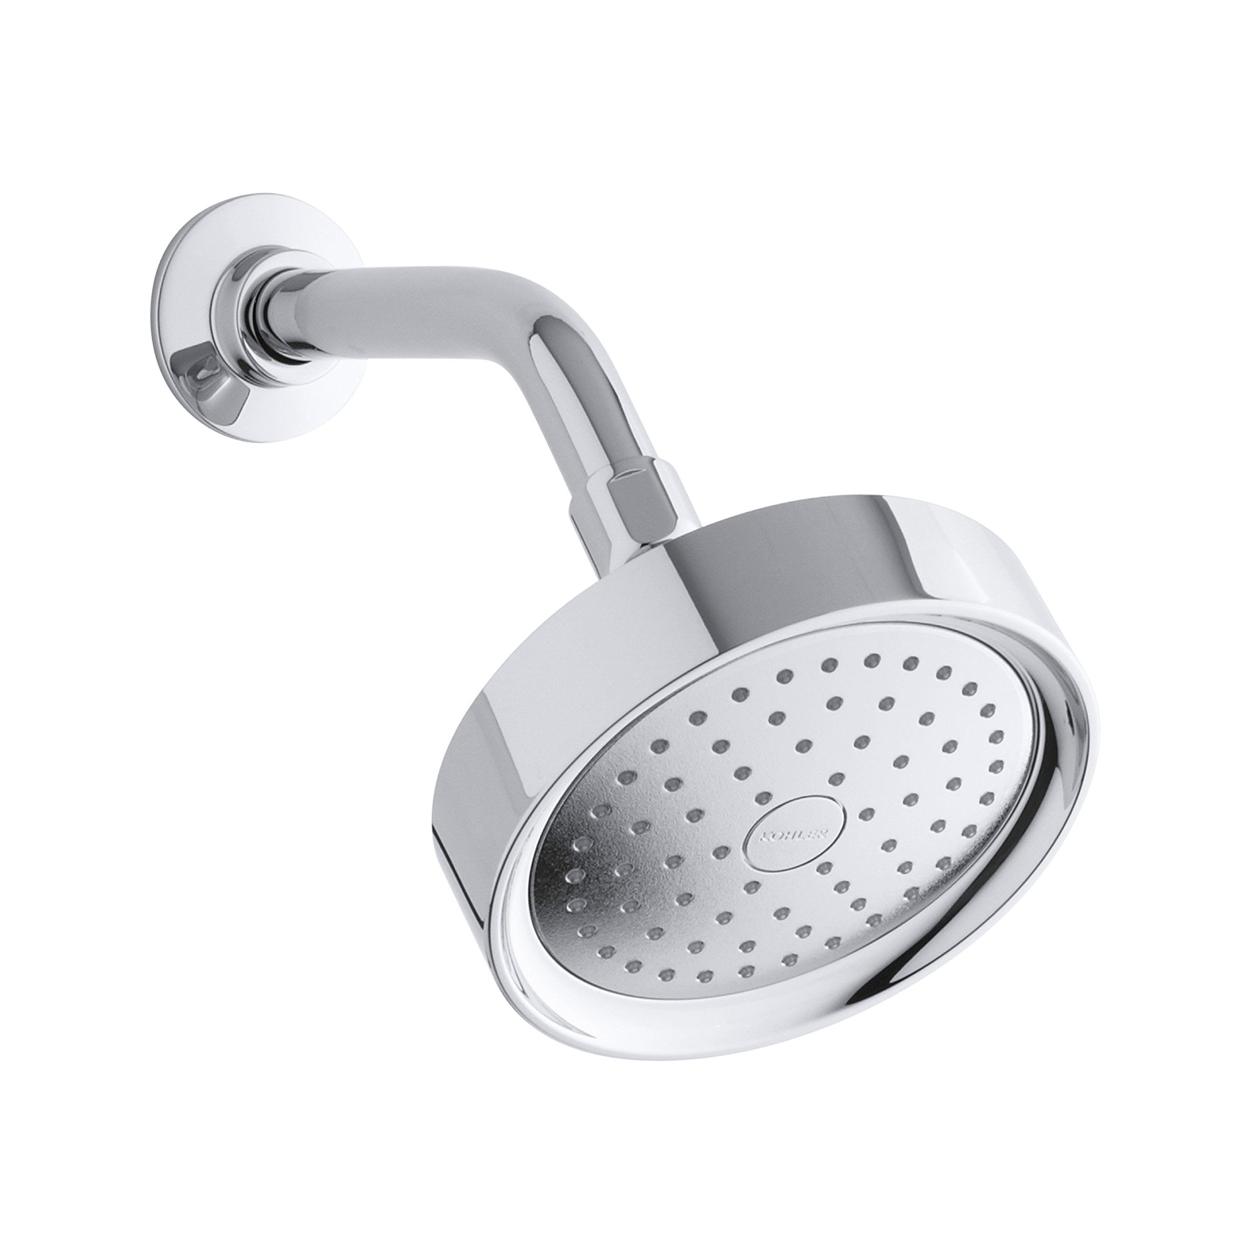 Kohler shower head.png